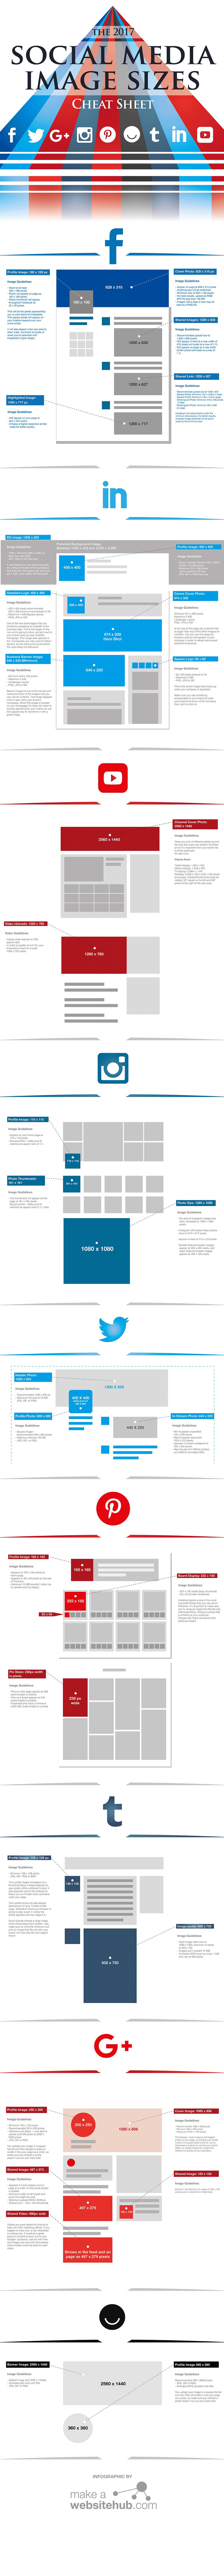 social-media-image-sizes-2017